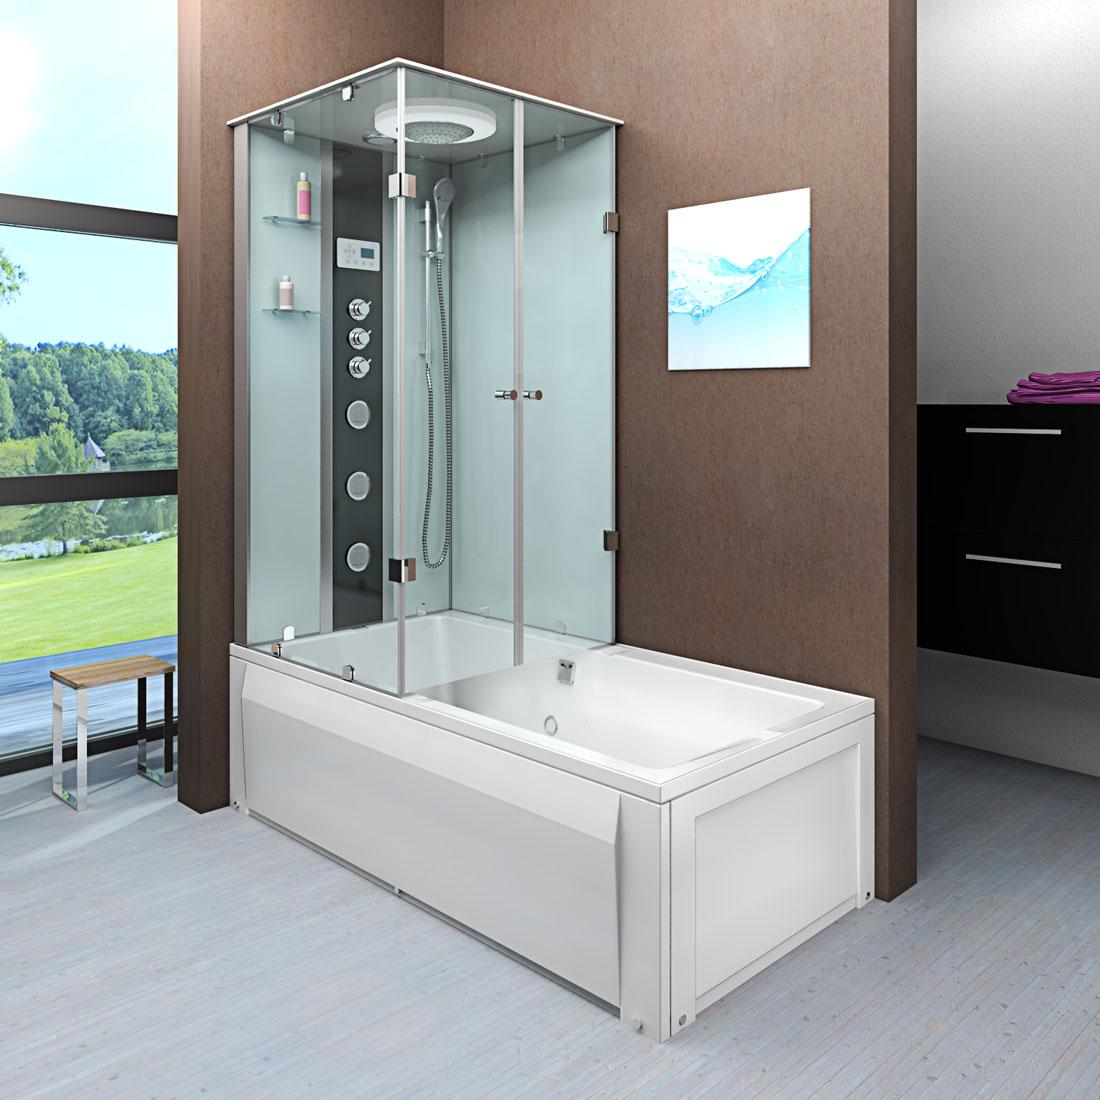 Acquavapore Dtp50 A005r Wanne Duschtempel Badewanne Dusche